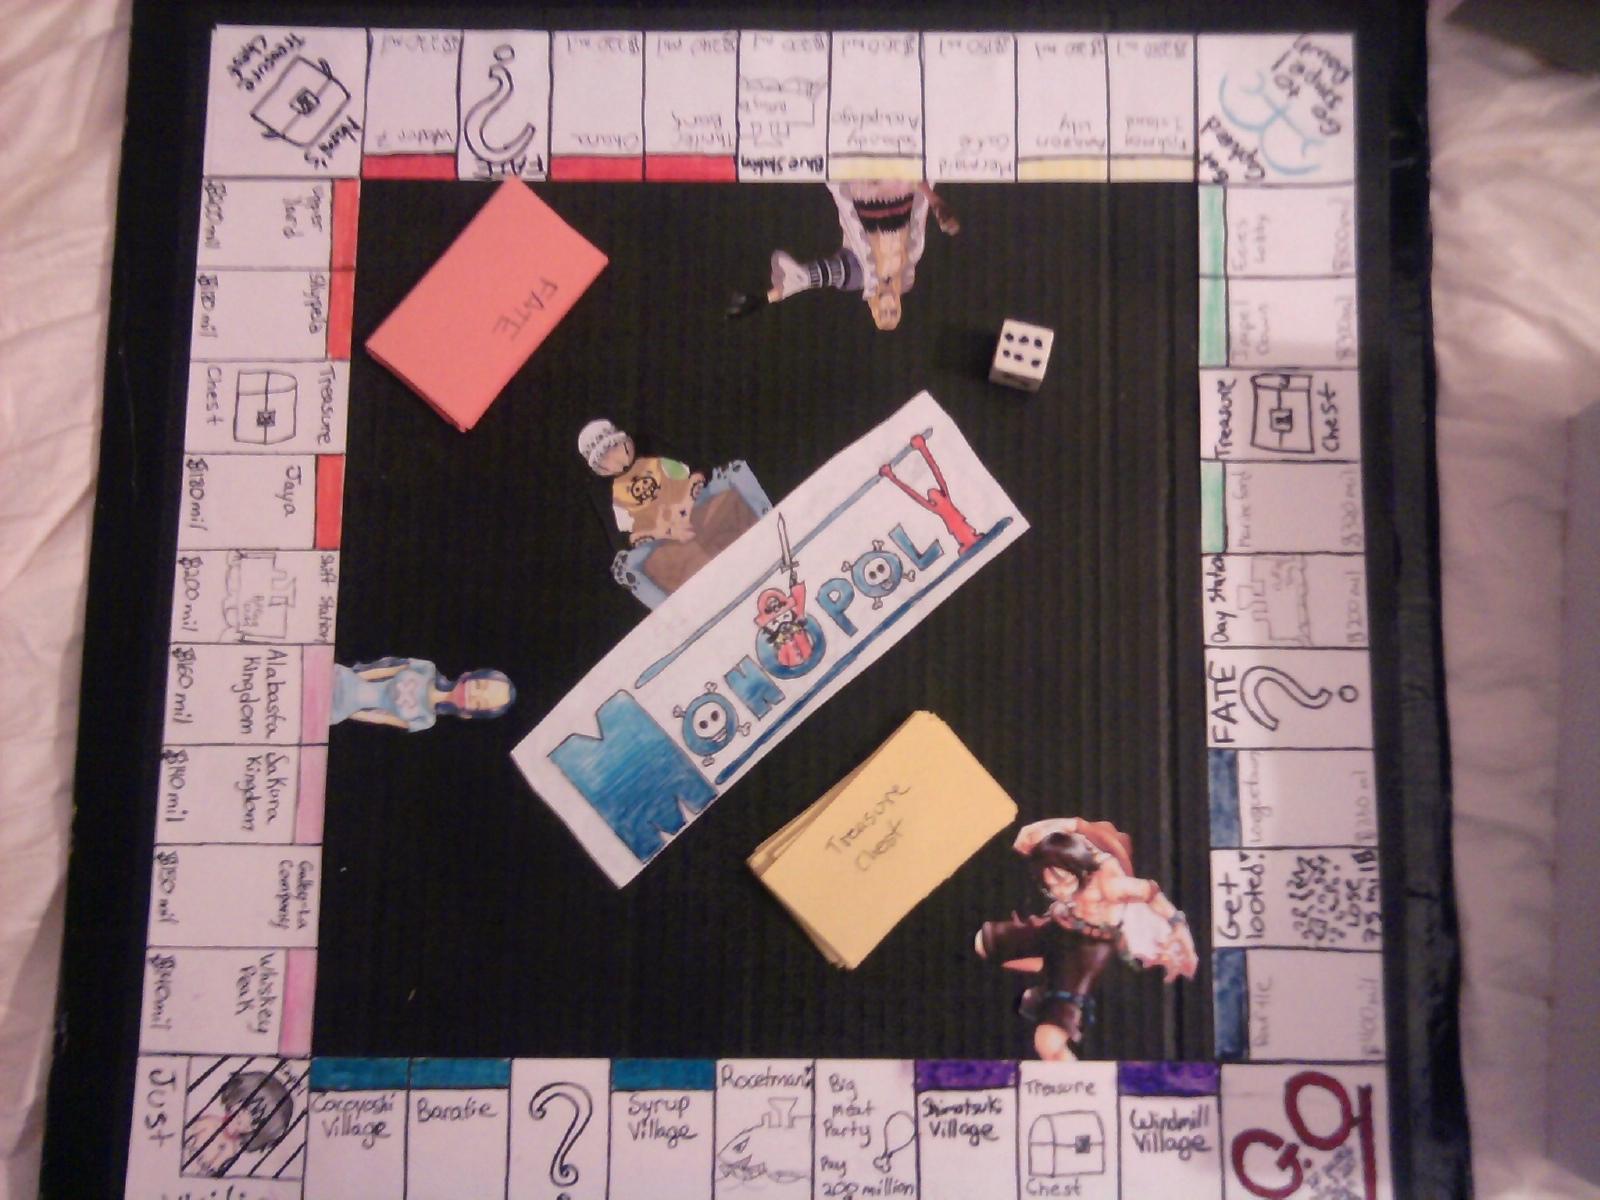 Monopoly one piece gma.amritasingh.com: Monopoly